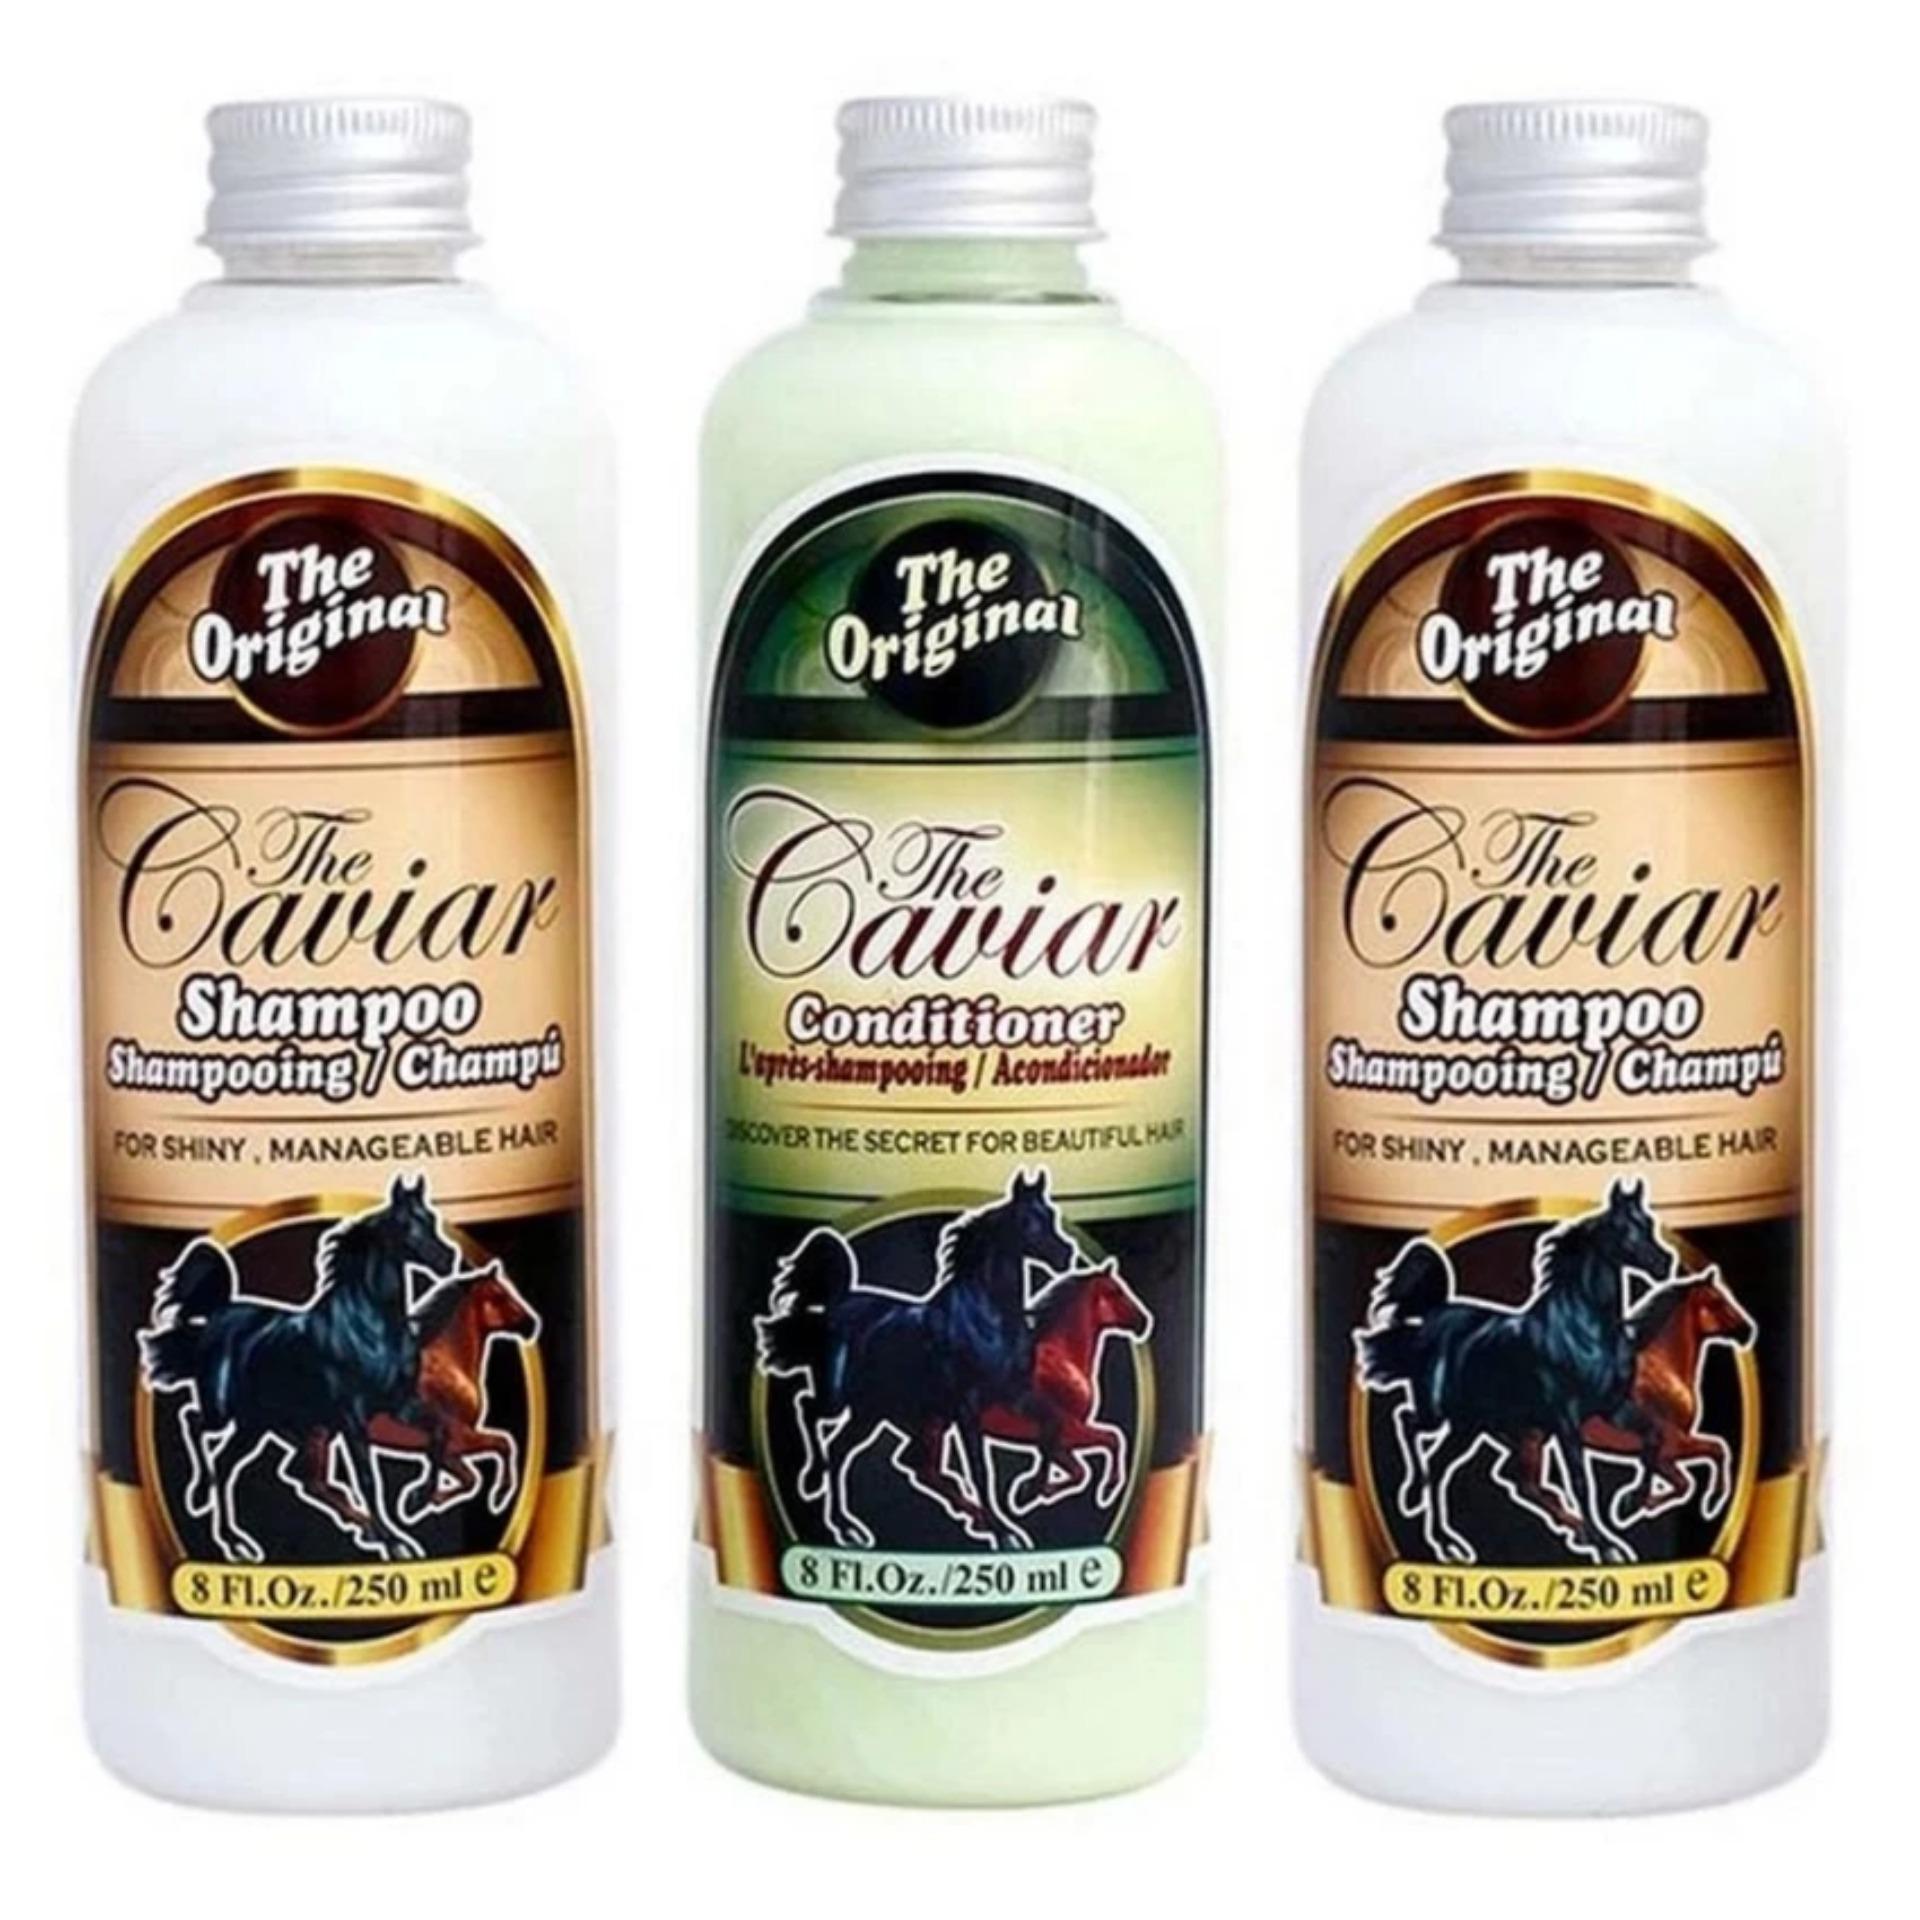 Penawaran Bagus Shampoo Caviar Sampo Kuda Paket 2 Shampo Dan 1 Conditioner The Original Flash Sale Kondisioner Bpom